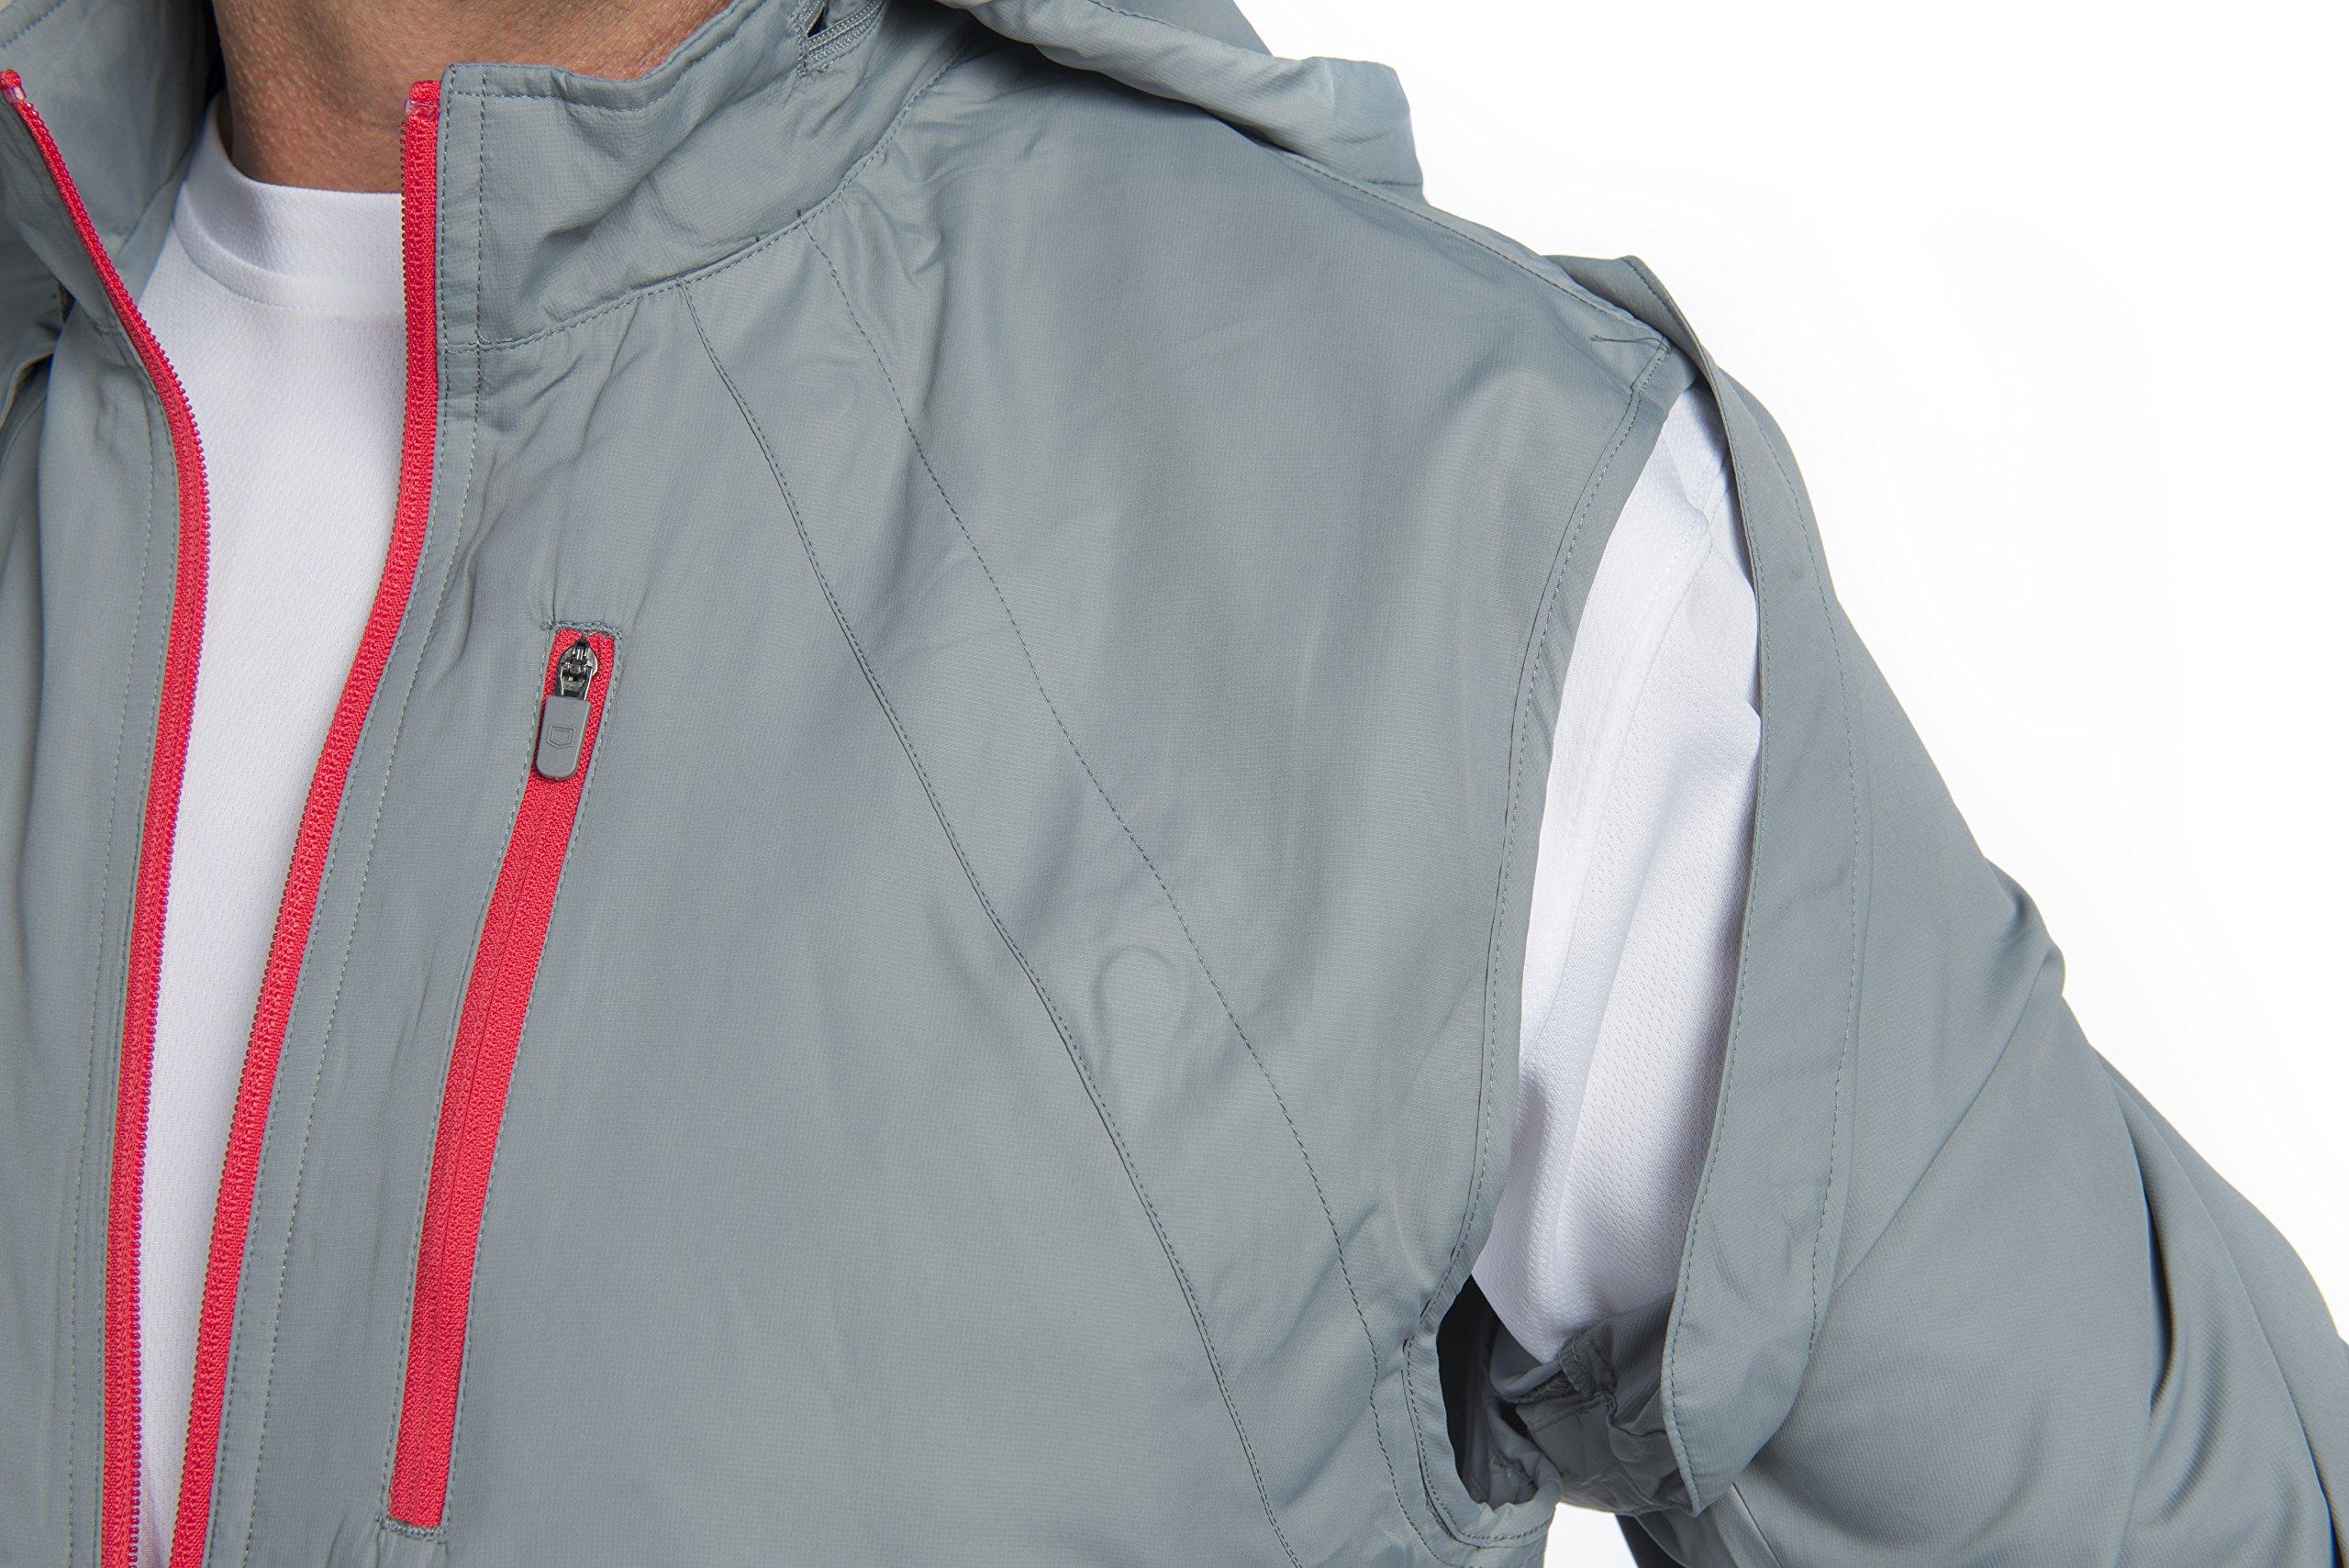 SCOTTeVEST Tropiformer Jacket - 22 Pockets – Convertible, Travel Clothing RED L by SCOTTeVEST (Image #6)